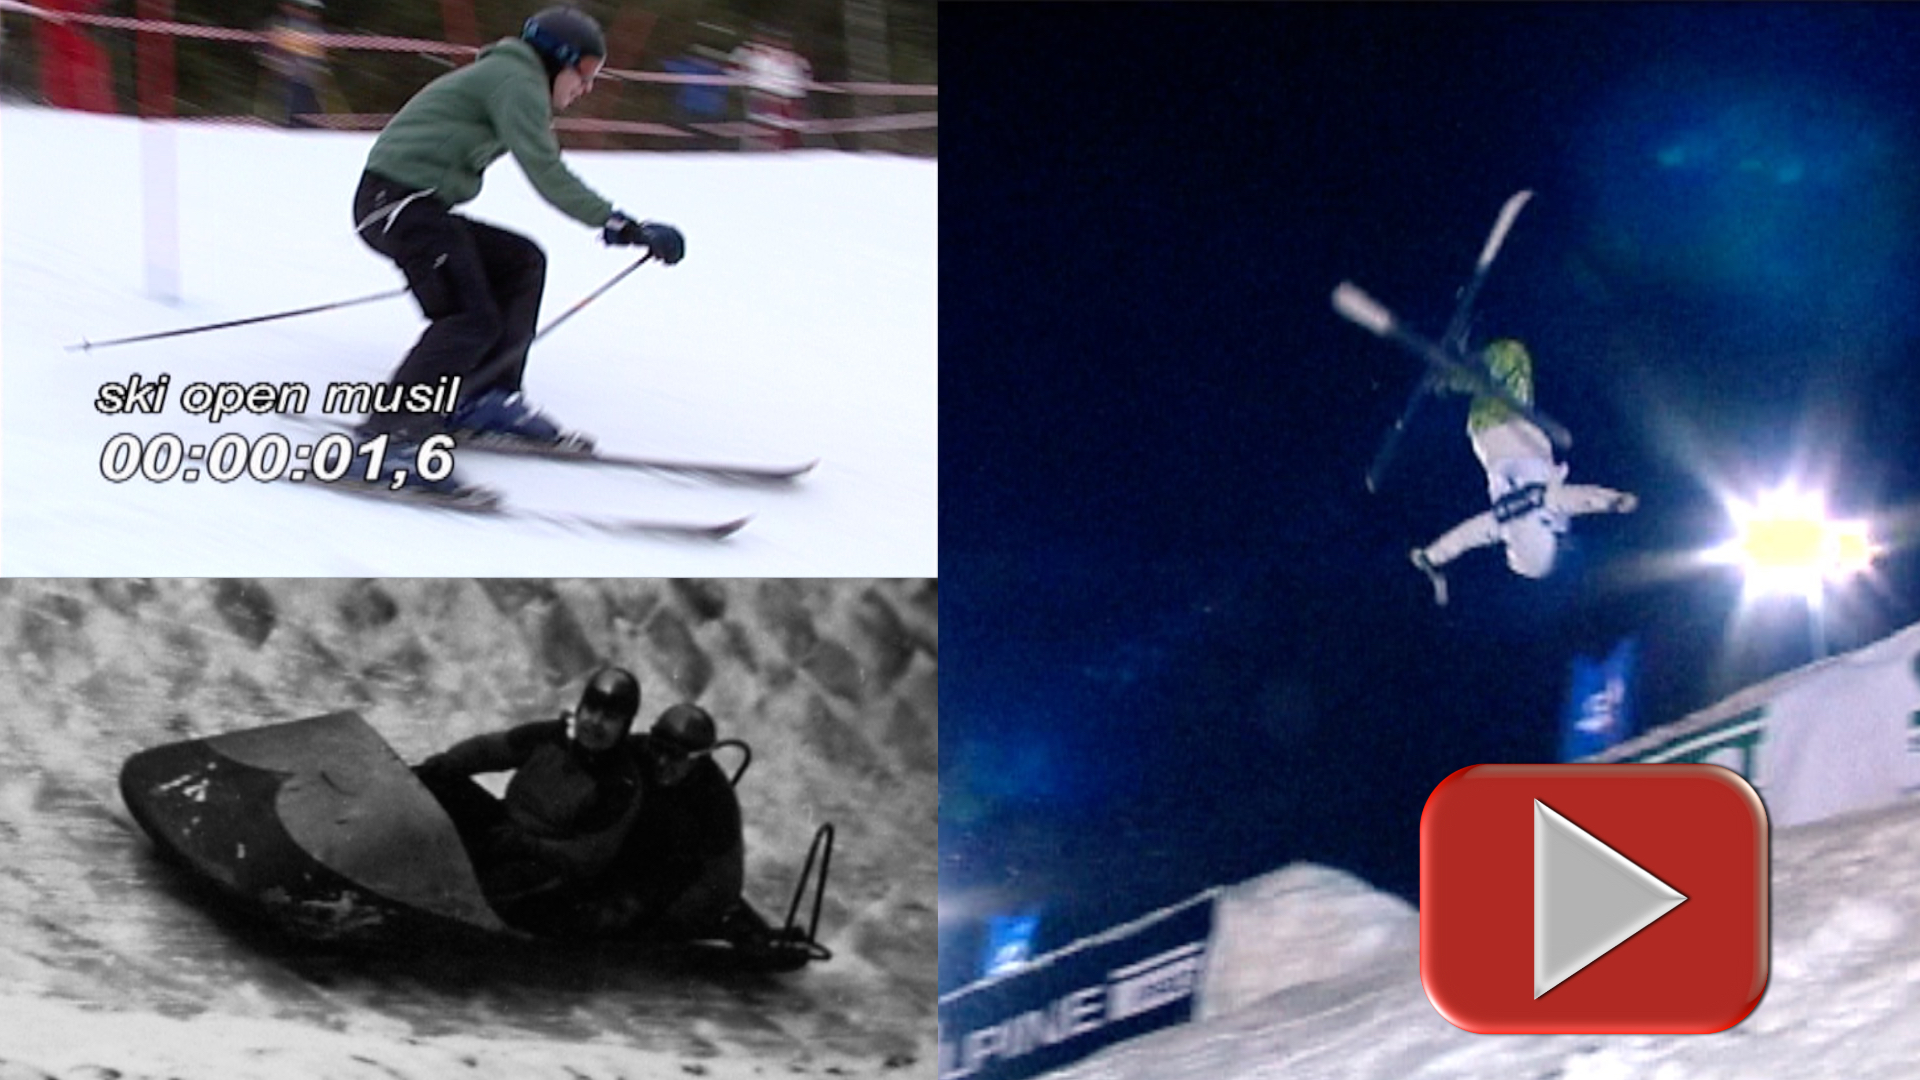 zimni_sportyweb